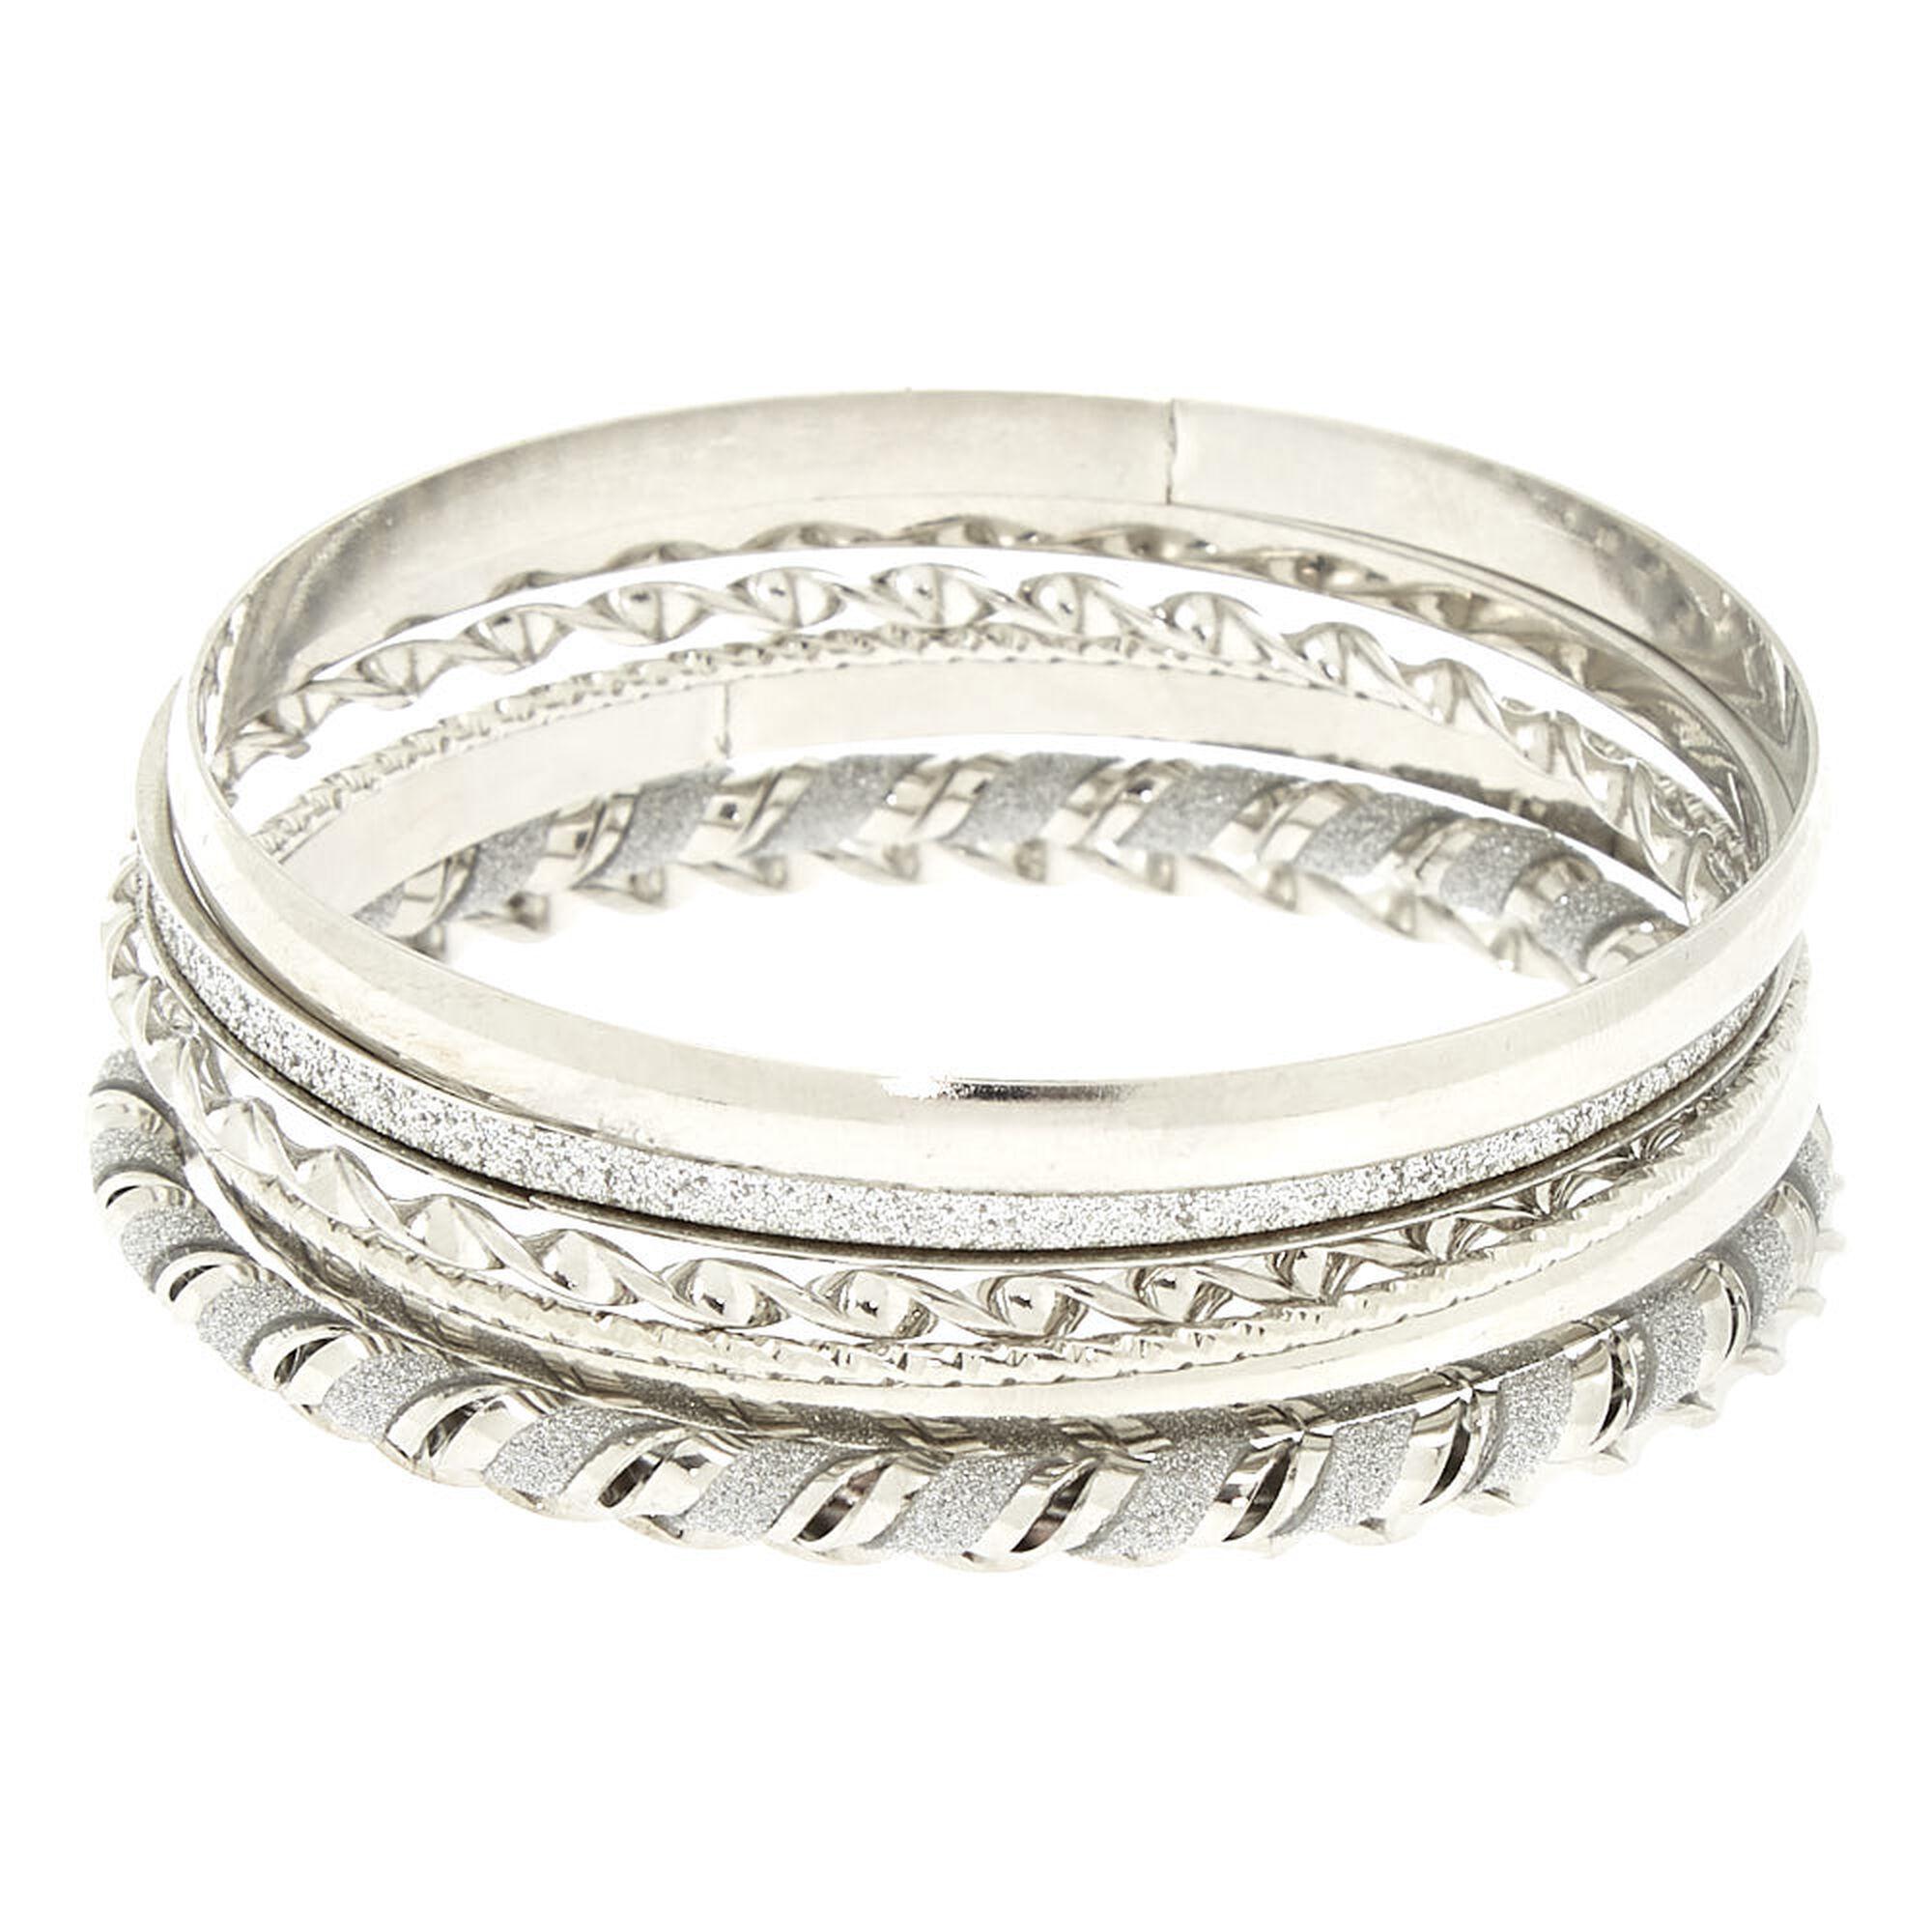 Silver Glitter Twist Bangle Bracelets 7 Pack